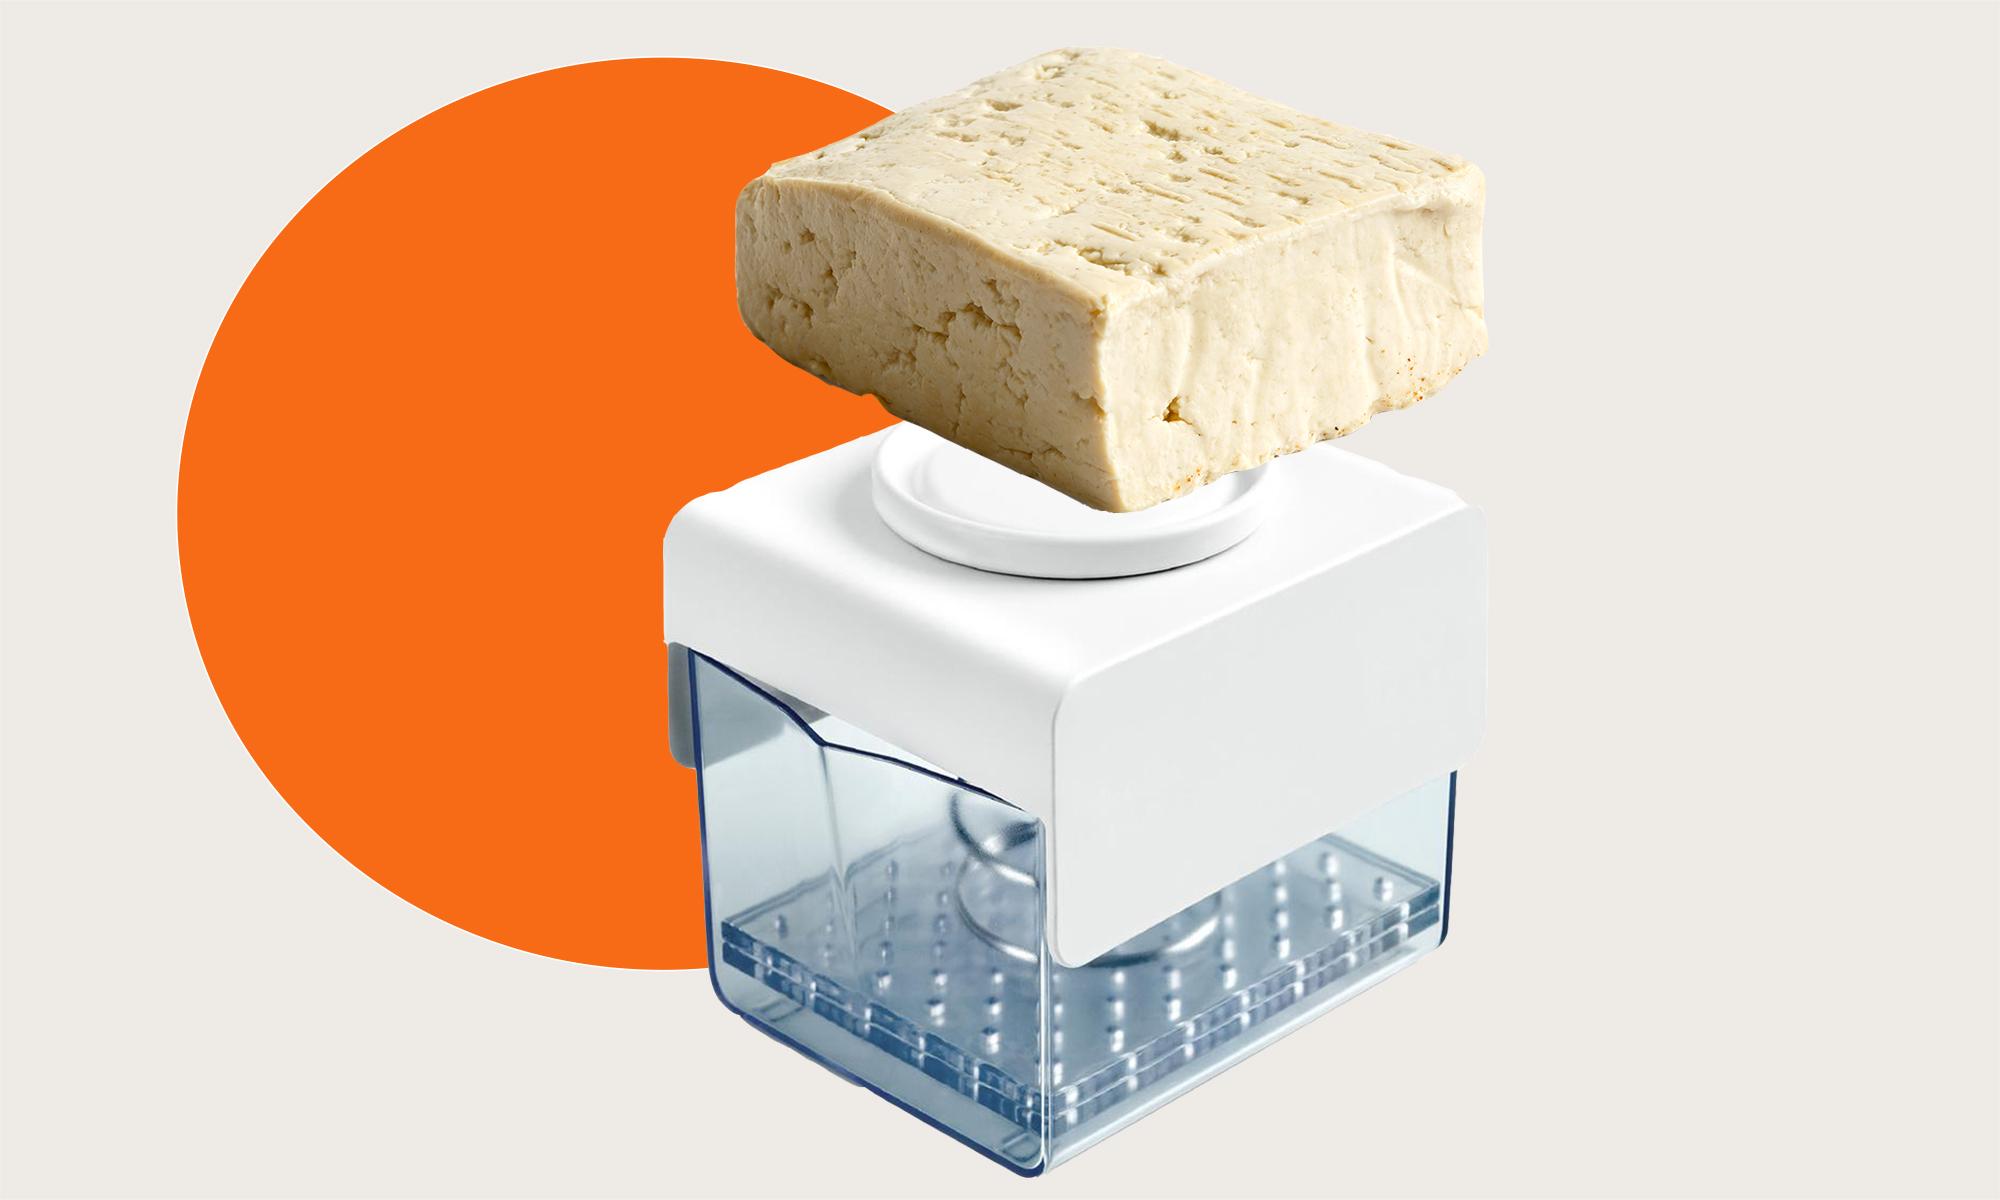 A tofu press and block of tofu